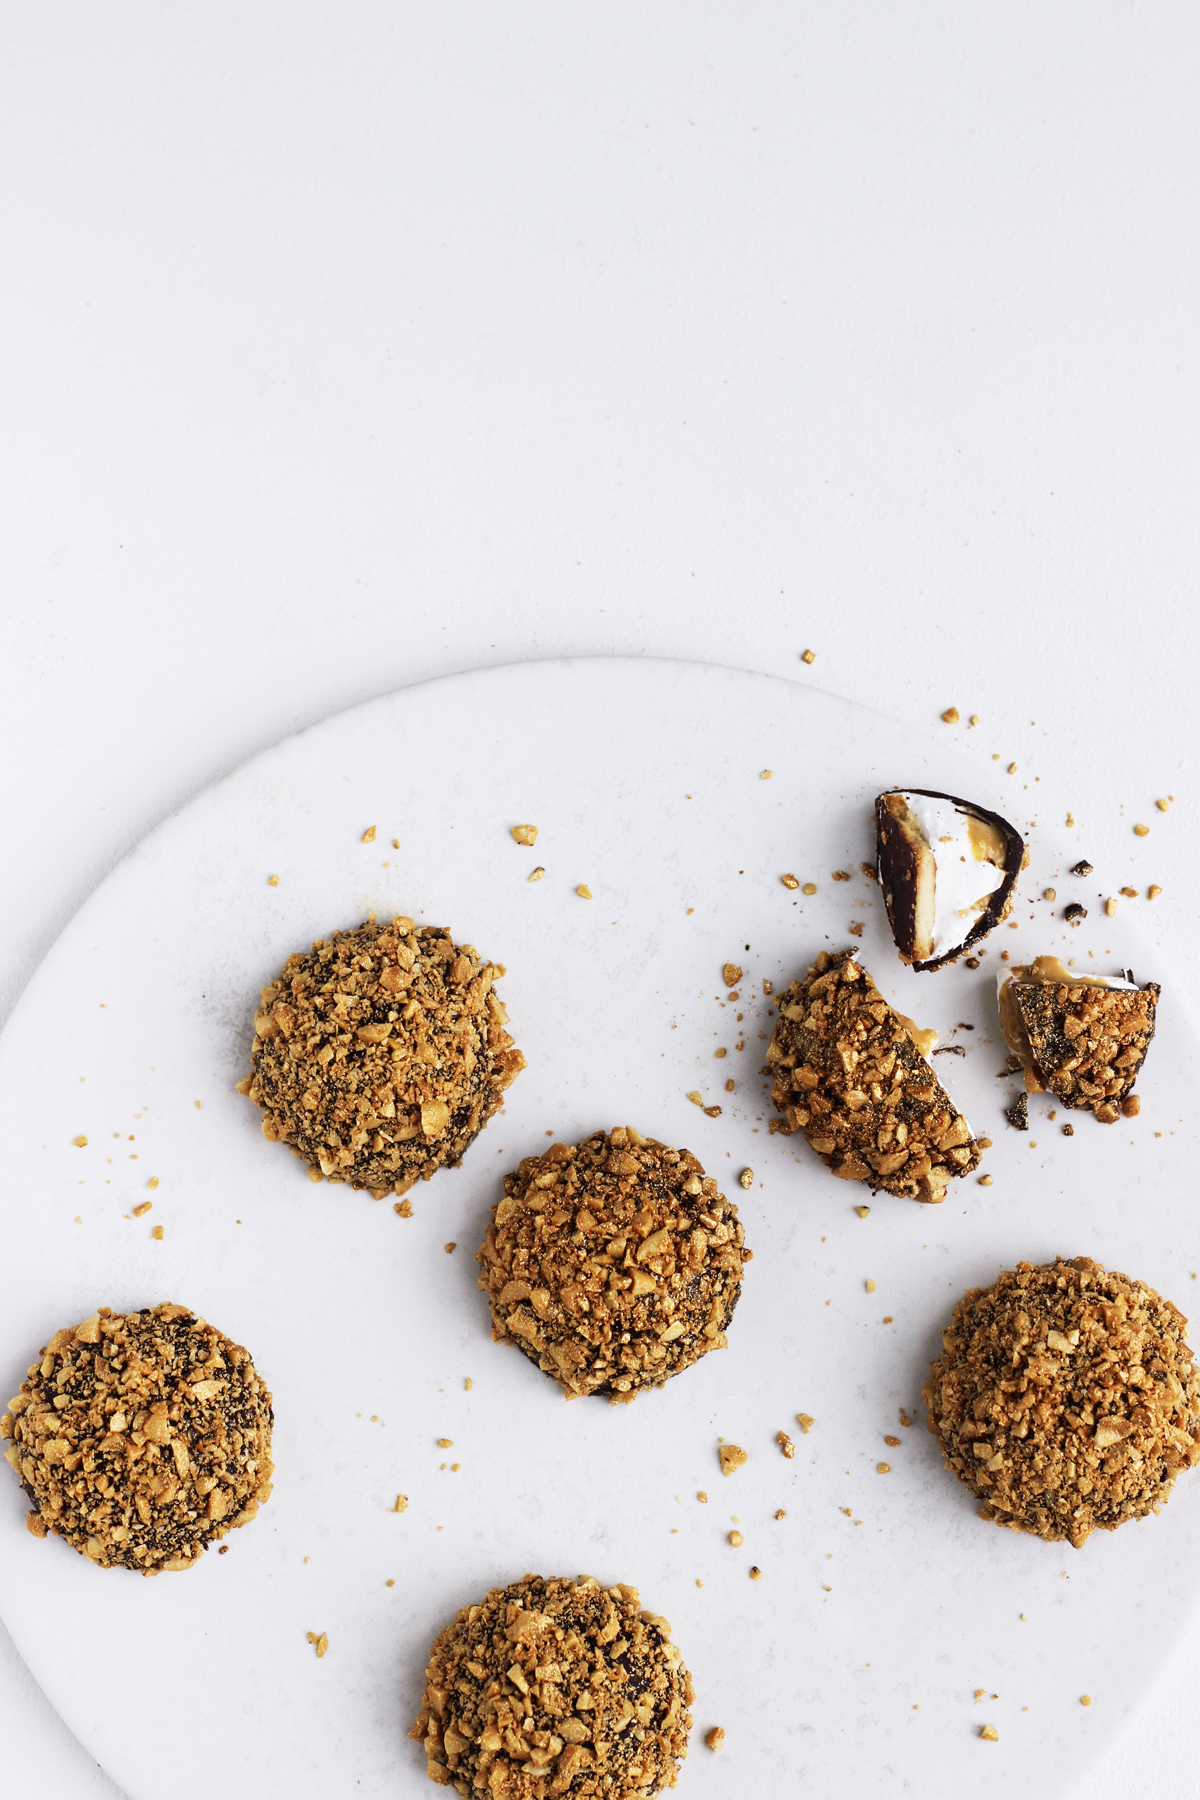 Flødeboller med peanuts og karamel